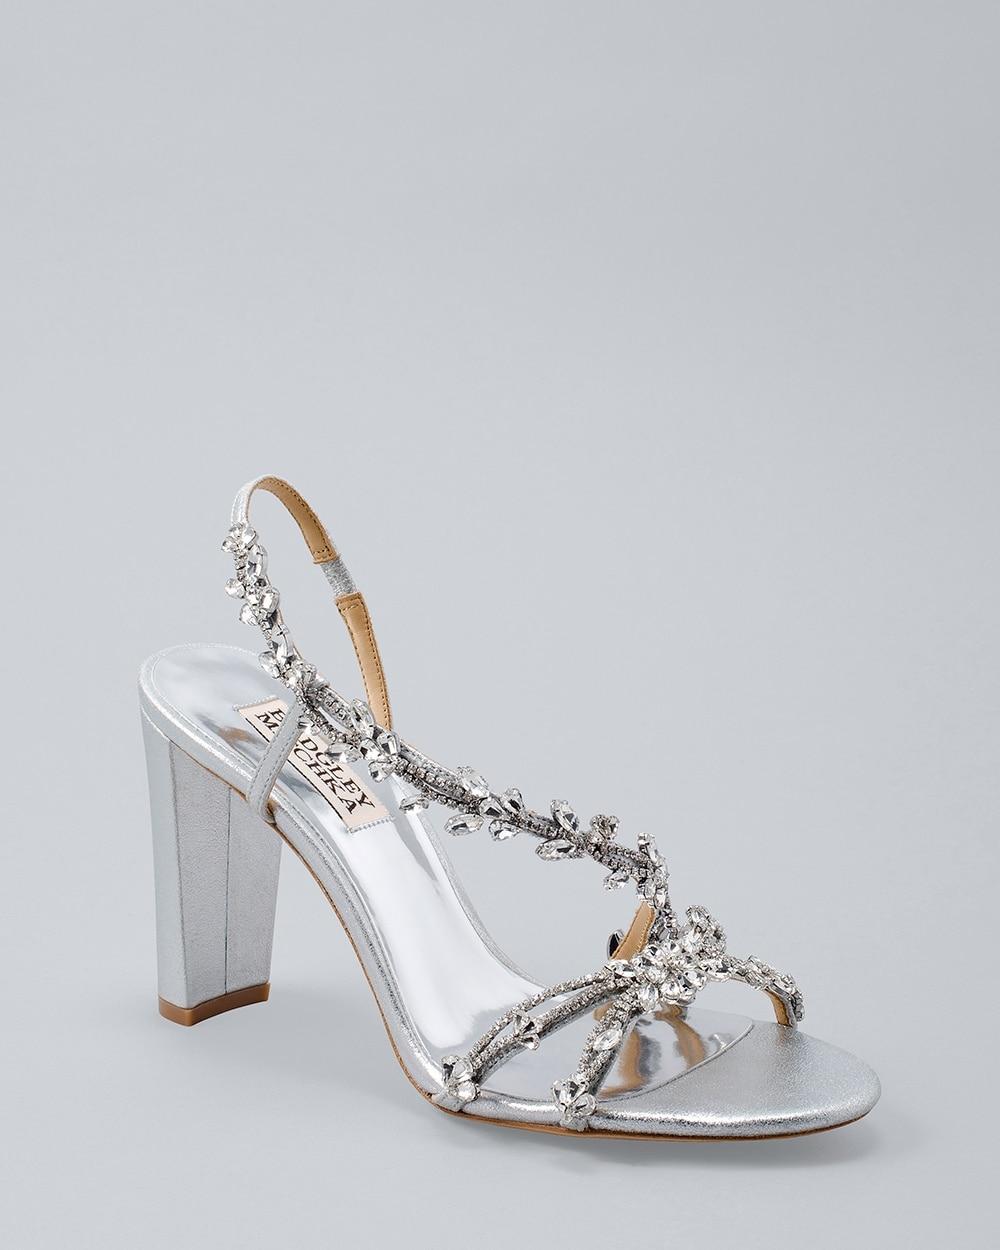 a788a29b7 Badgley Mischka Felda Embellished Foil-Suede Strappy Heels - White House  Black Market